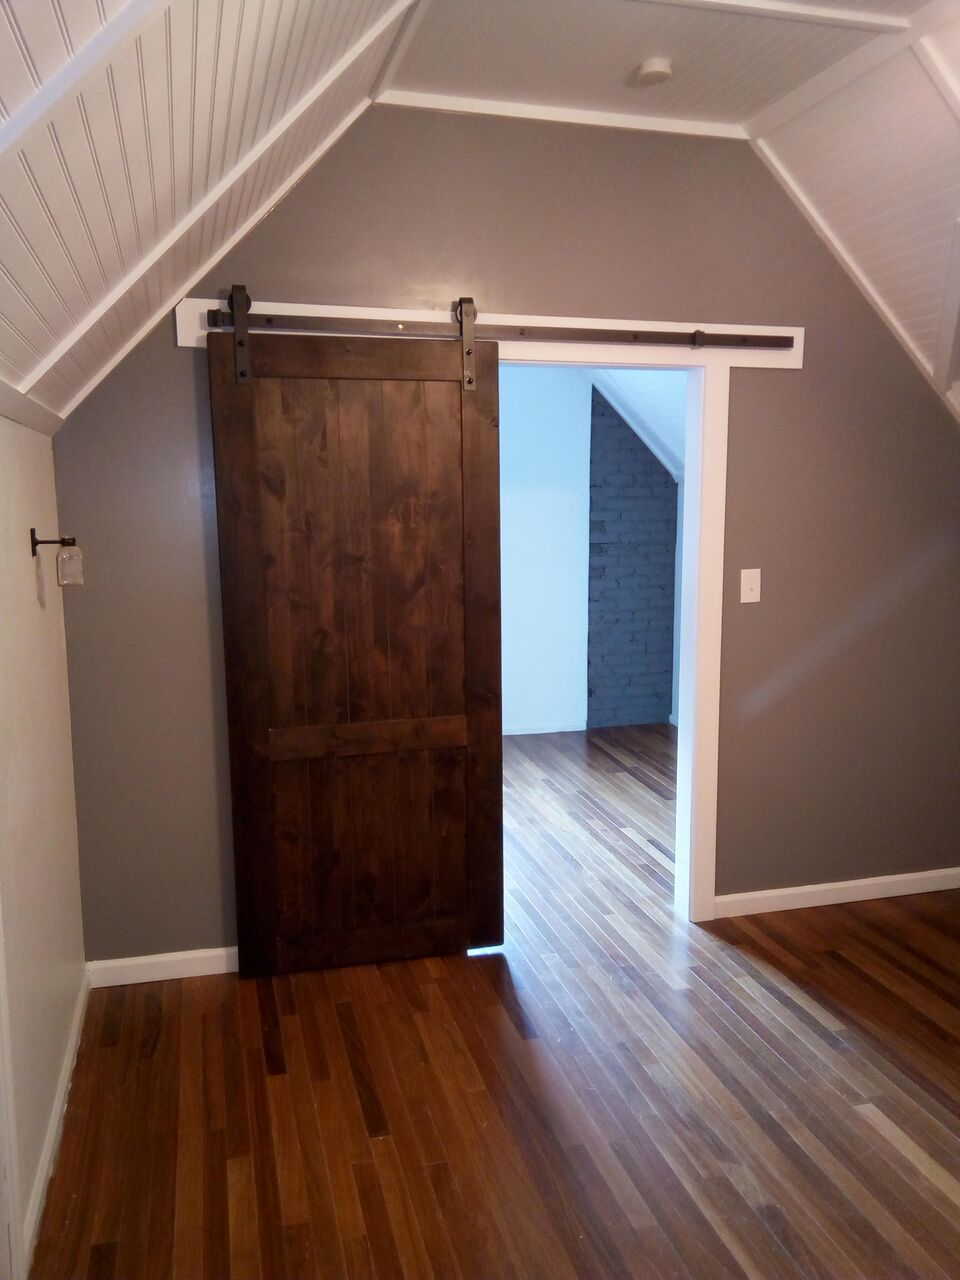 Narrow hallway lighting ideas  Pin by Fixify Home Repair on Fixify Home Repair Projects  Pinterest